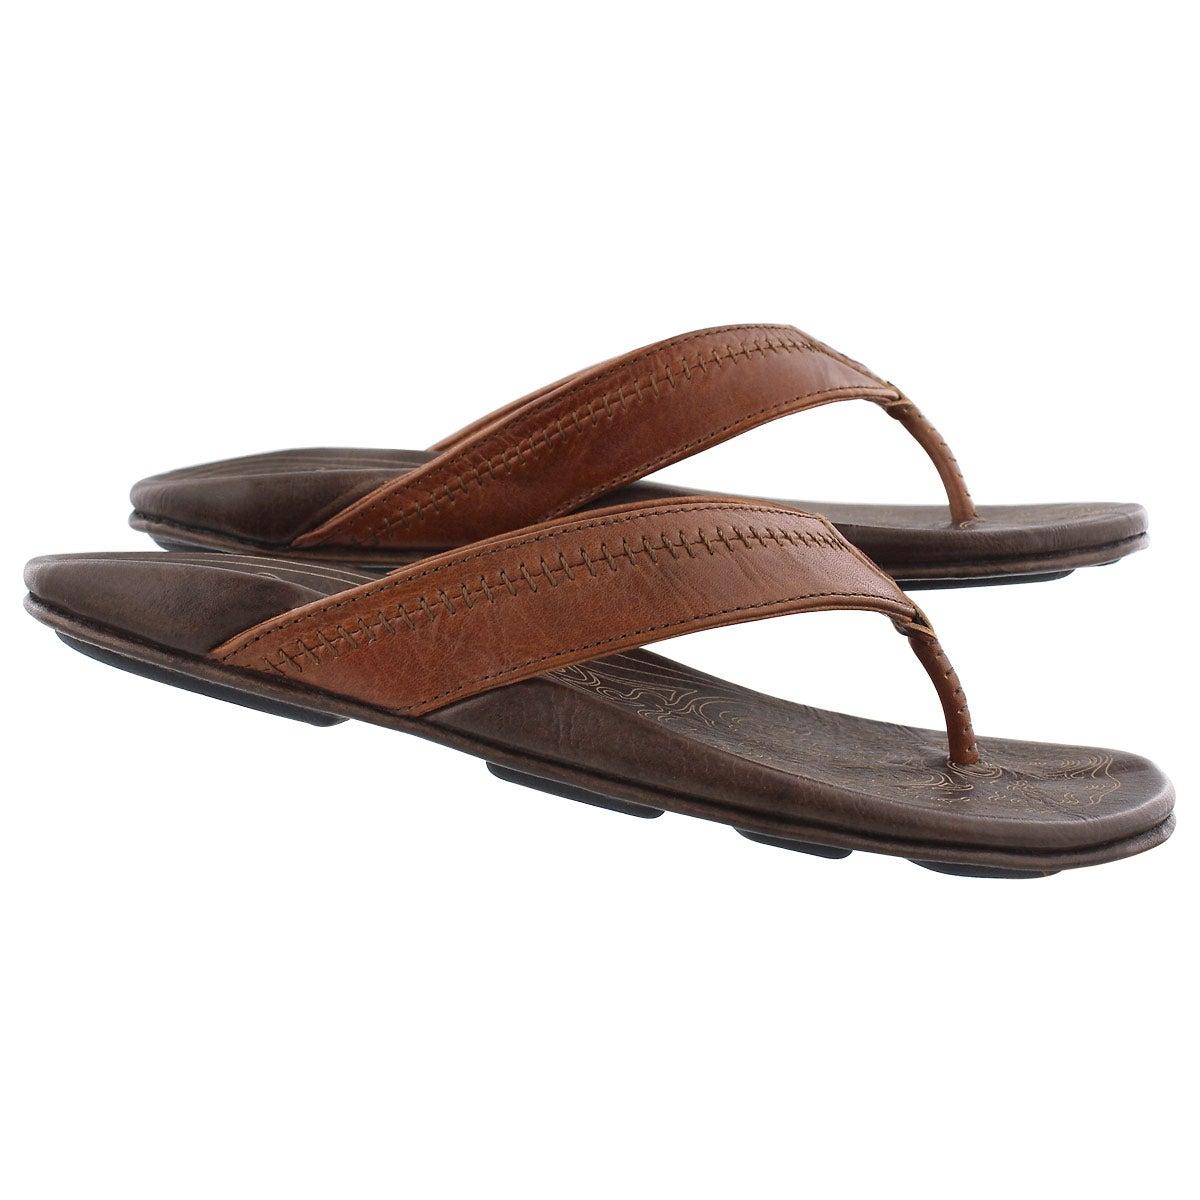 Mns Hiapo rum/dark lava thong sandal